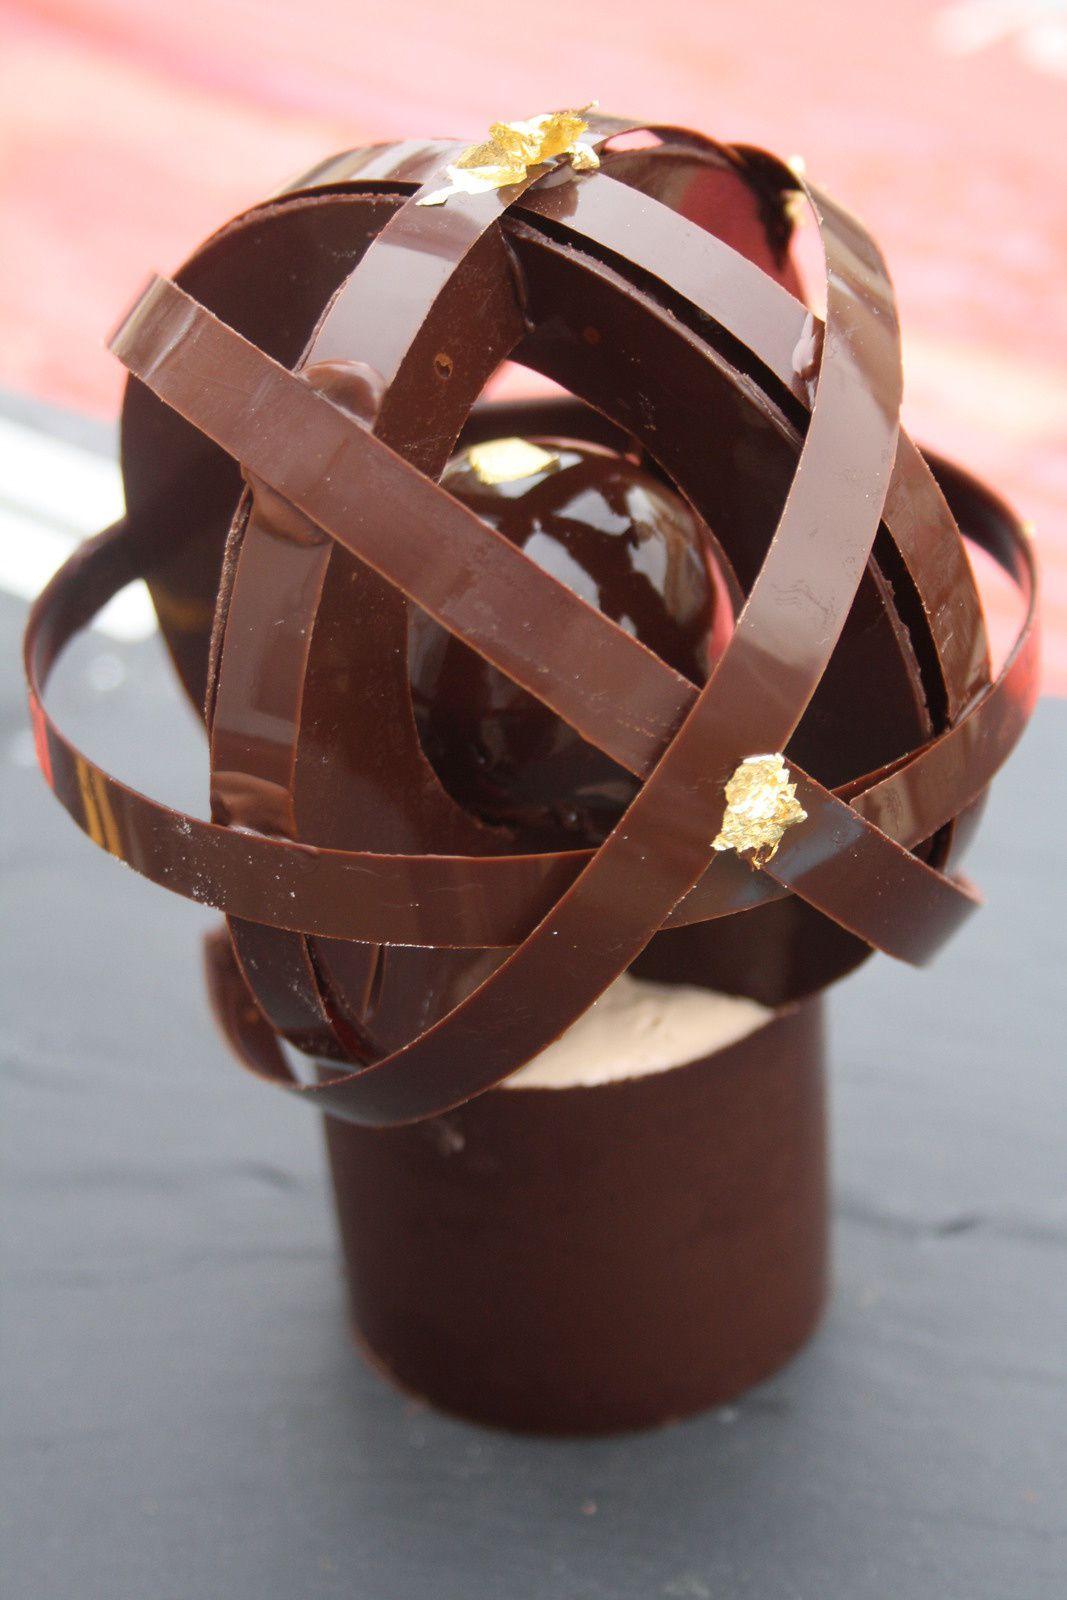 L'ATOME CHOCOLAT DE BENOIT CHARVET